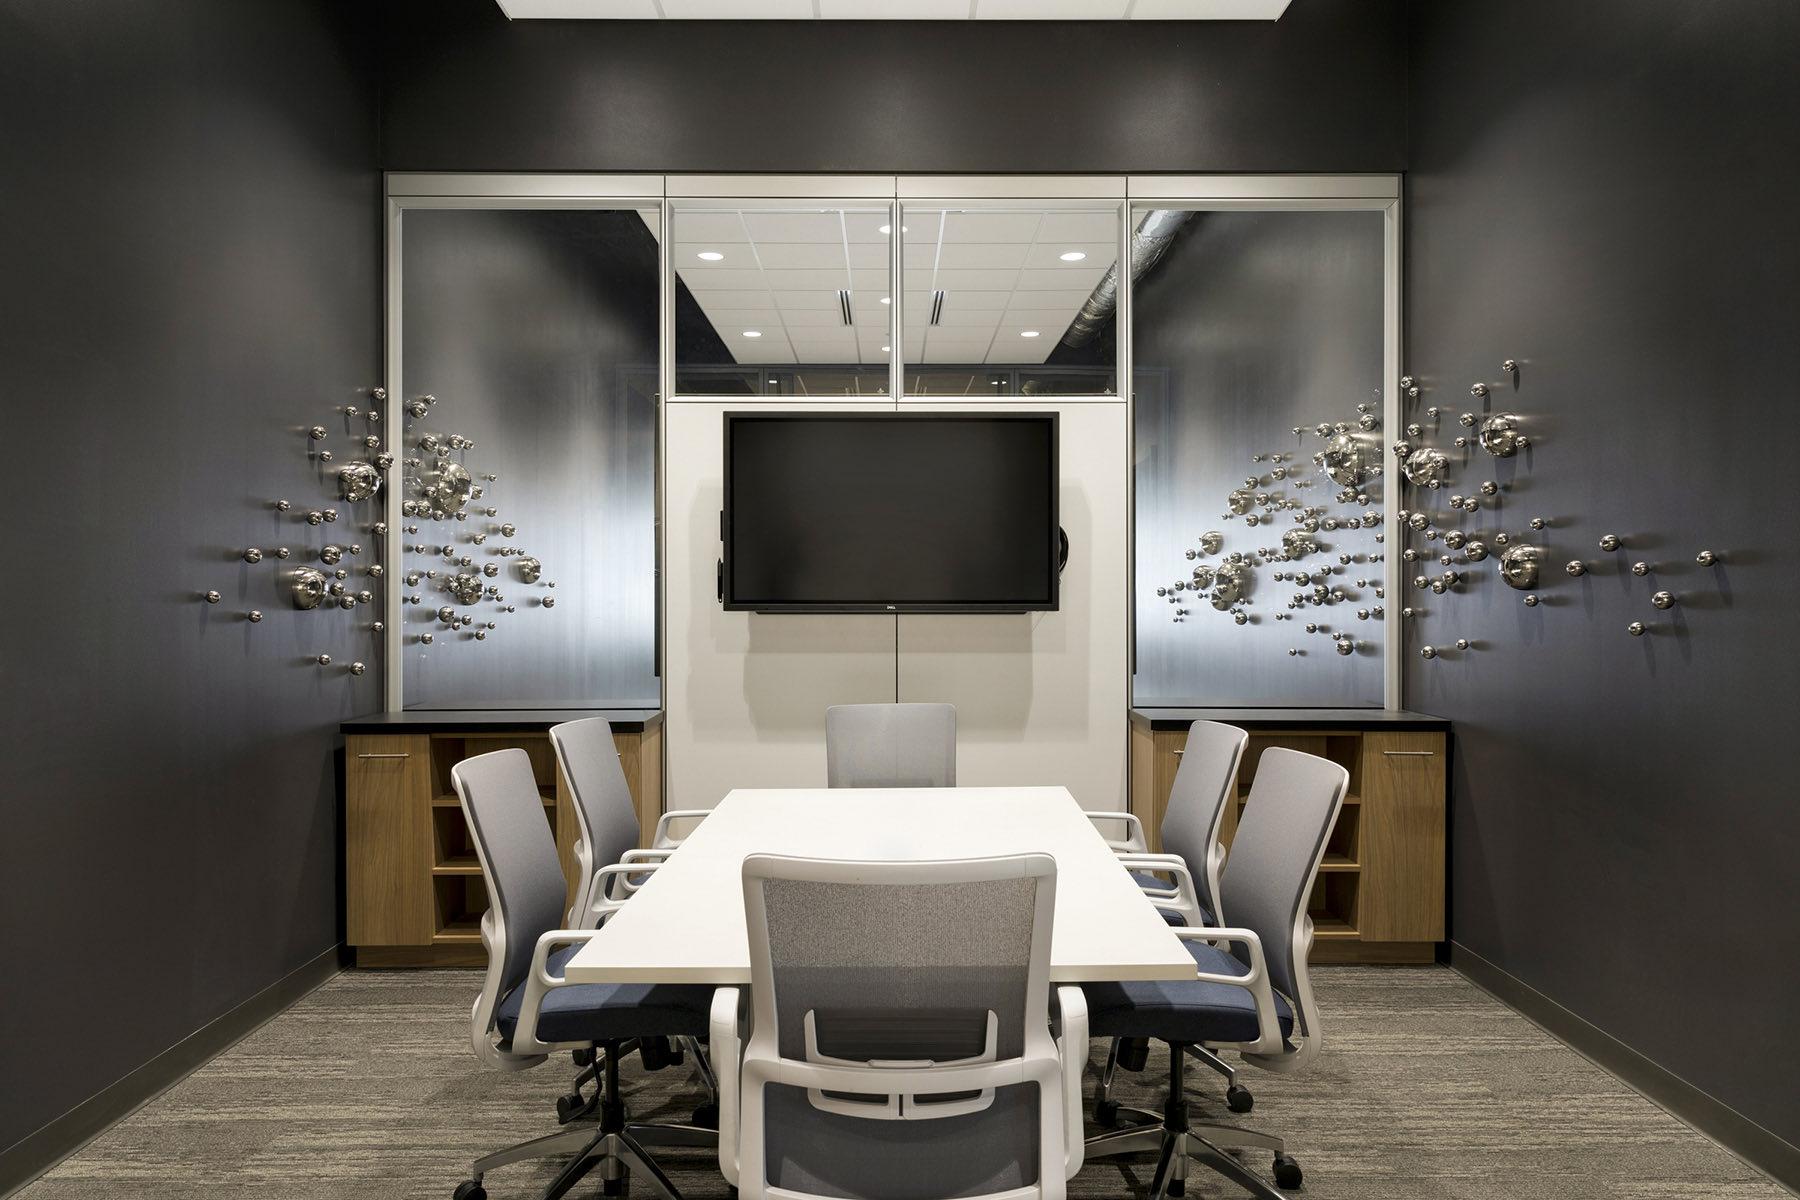 svl-minneapolis-office-4